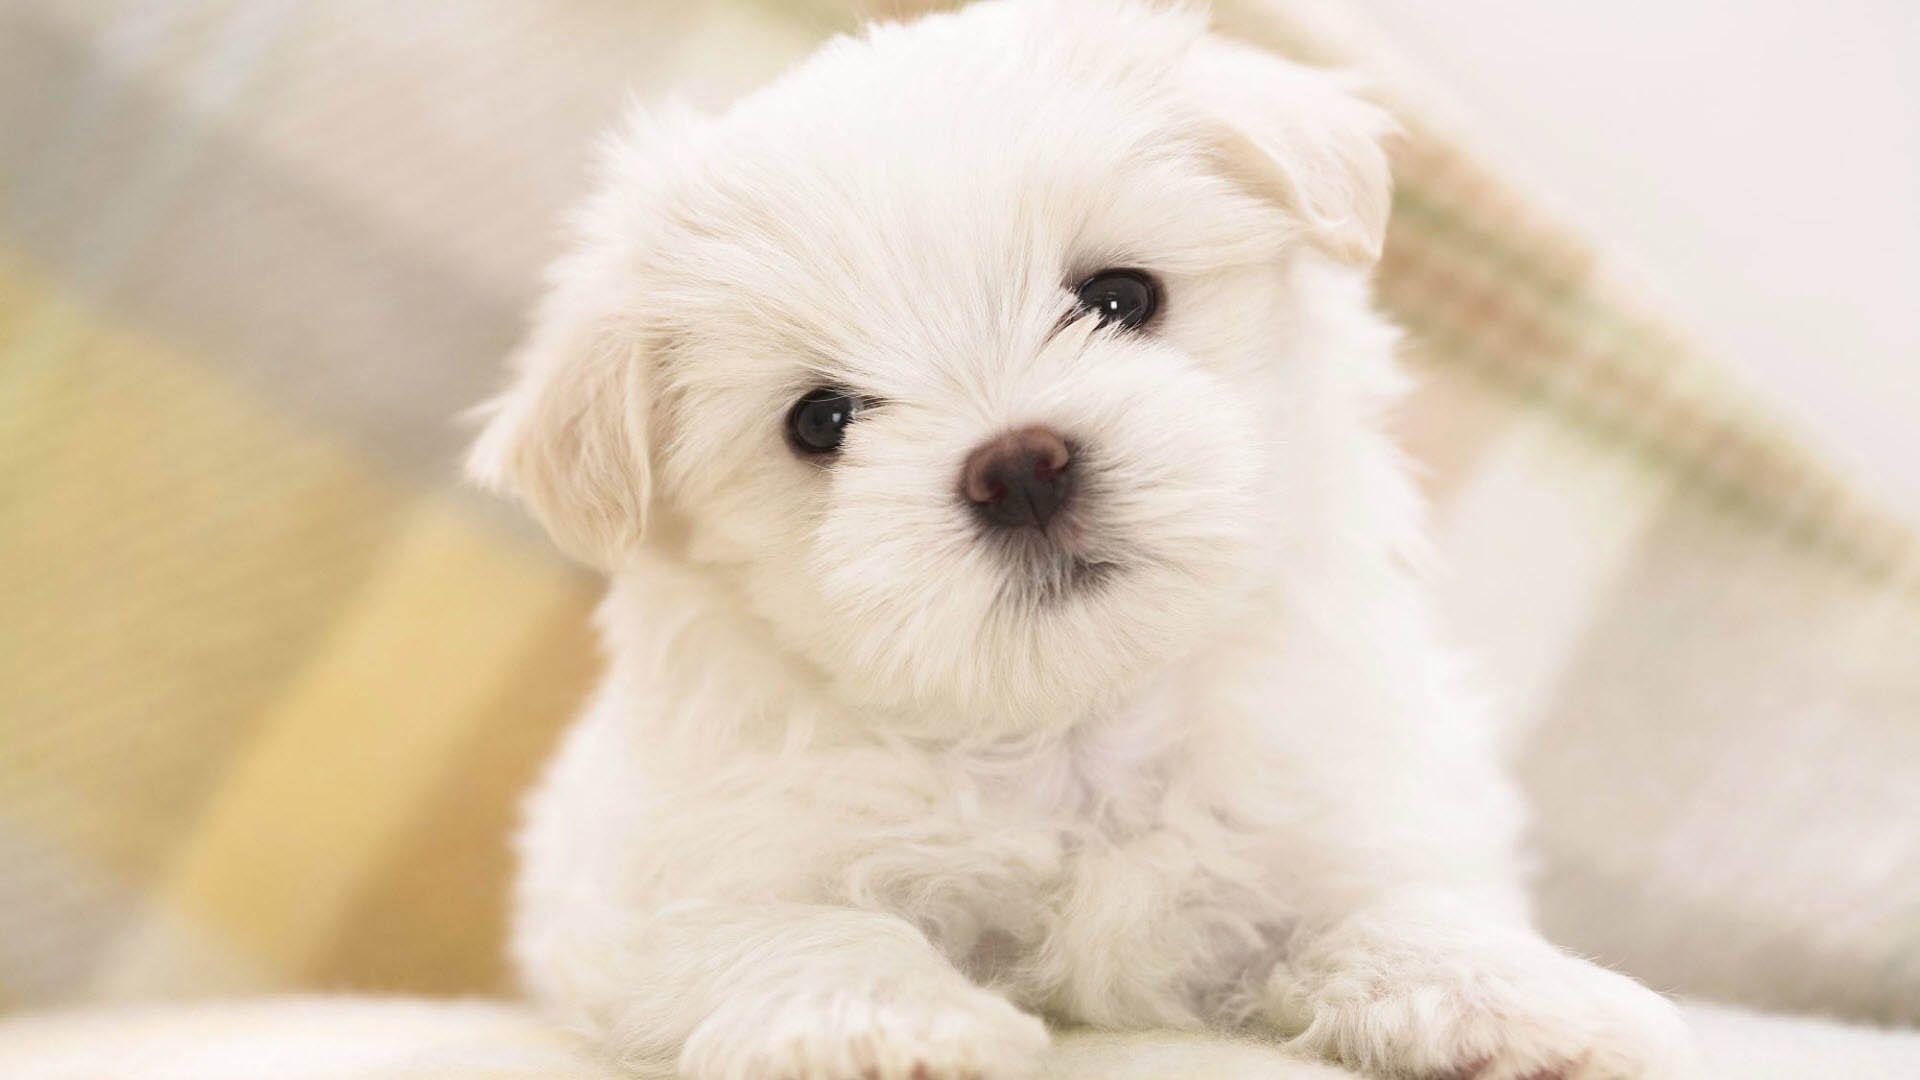 Cute Dog Wallpaper 77 Images